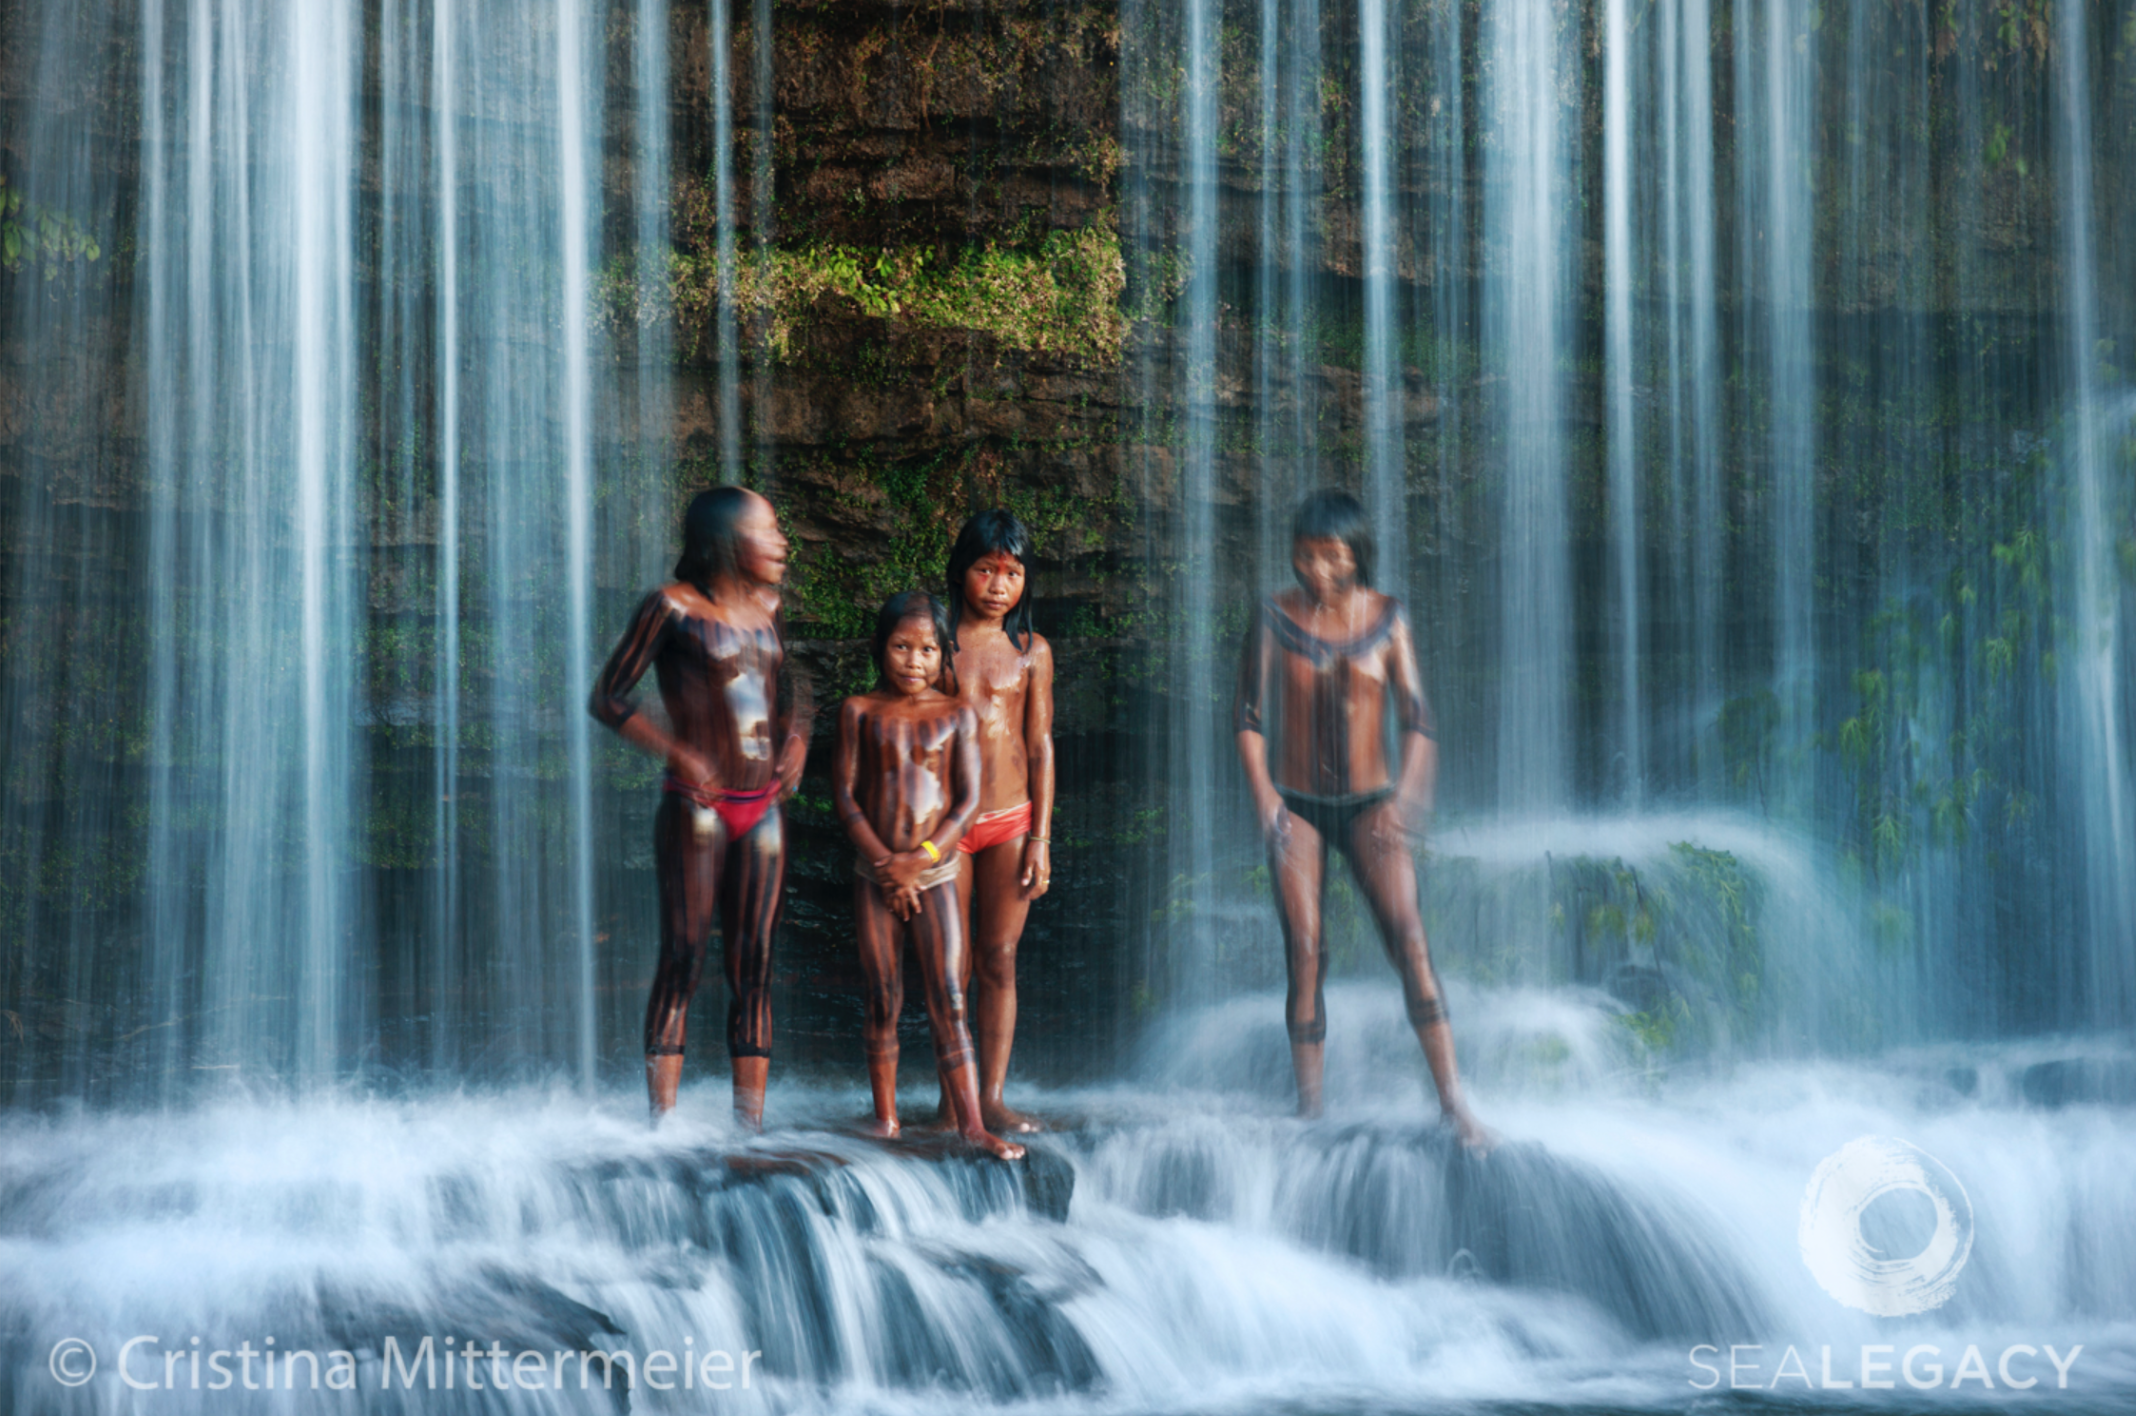 Cristina Mittermeier, Waterfall Bath  Digital Chromogenic Print on William Turner Cotton, 20x30 in.